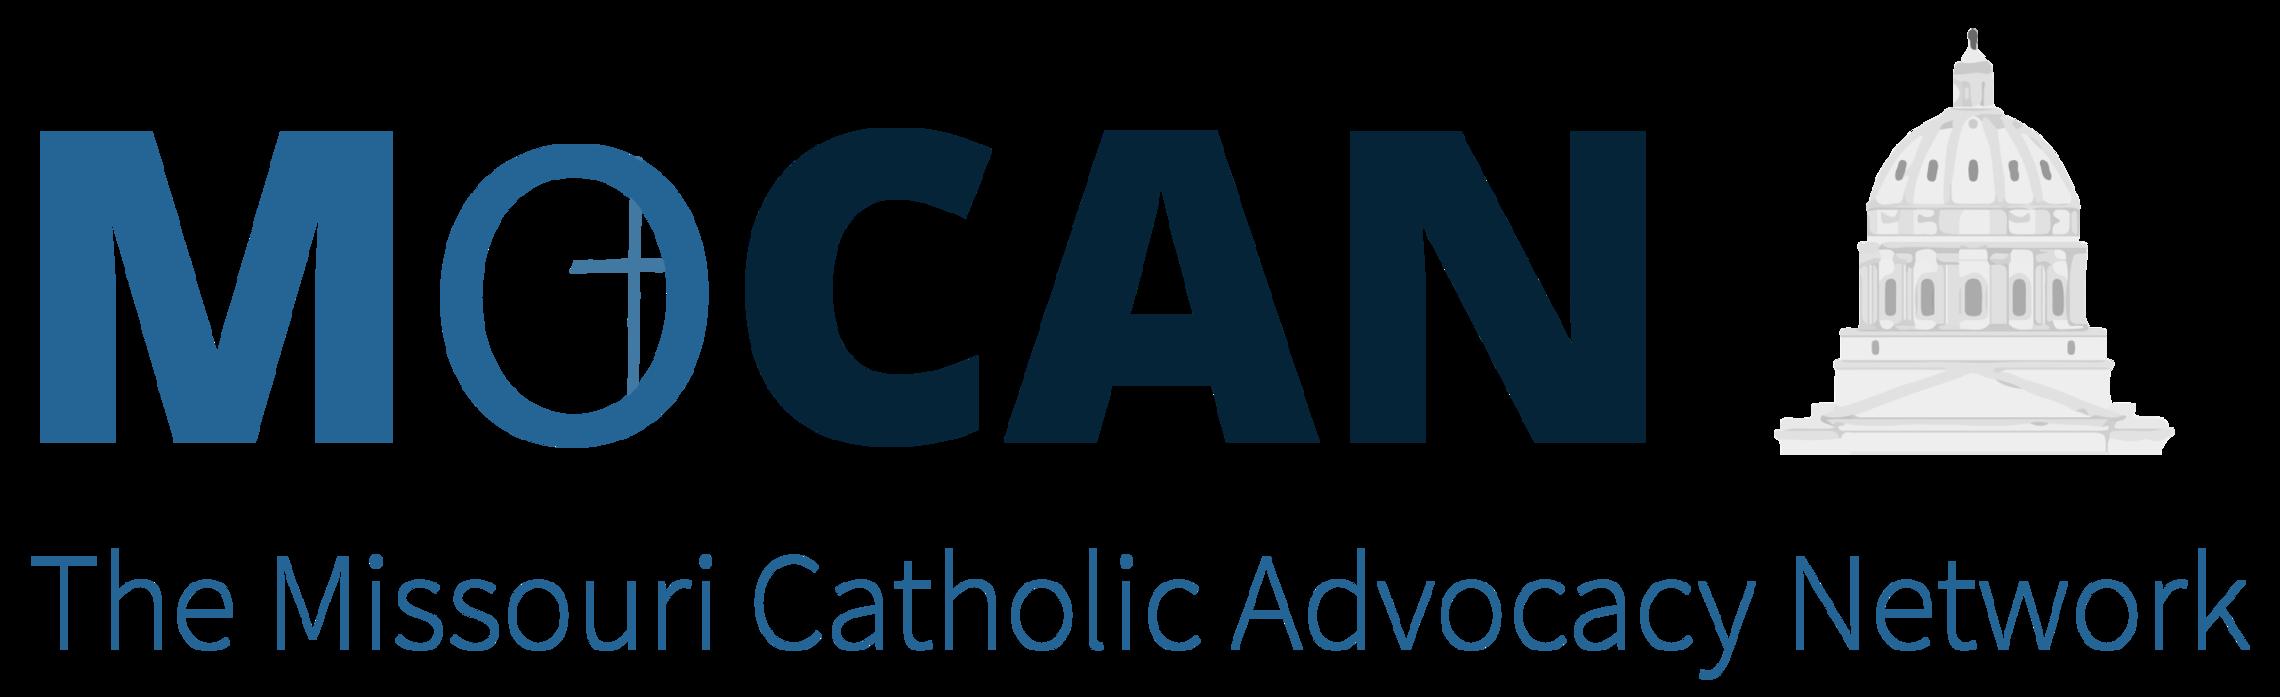 MOCAN logo